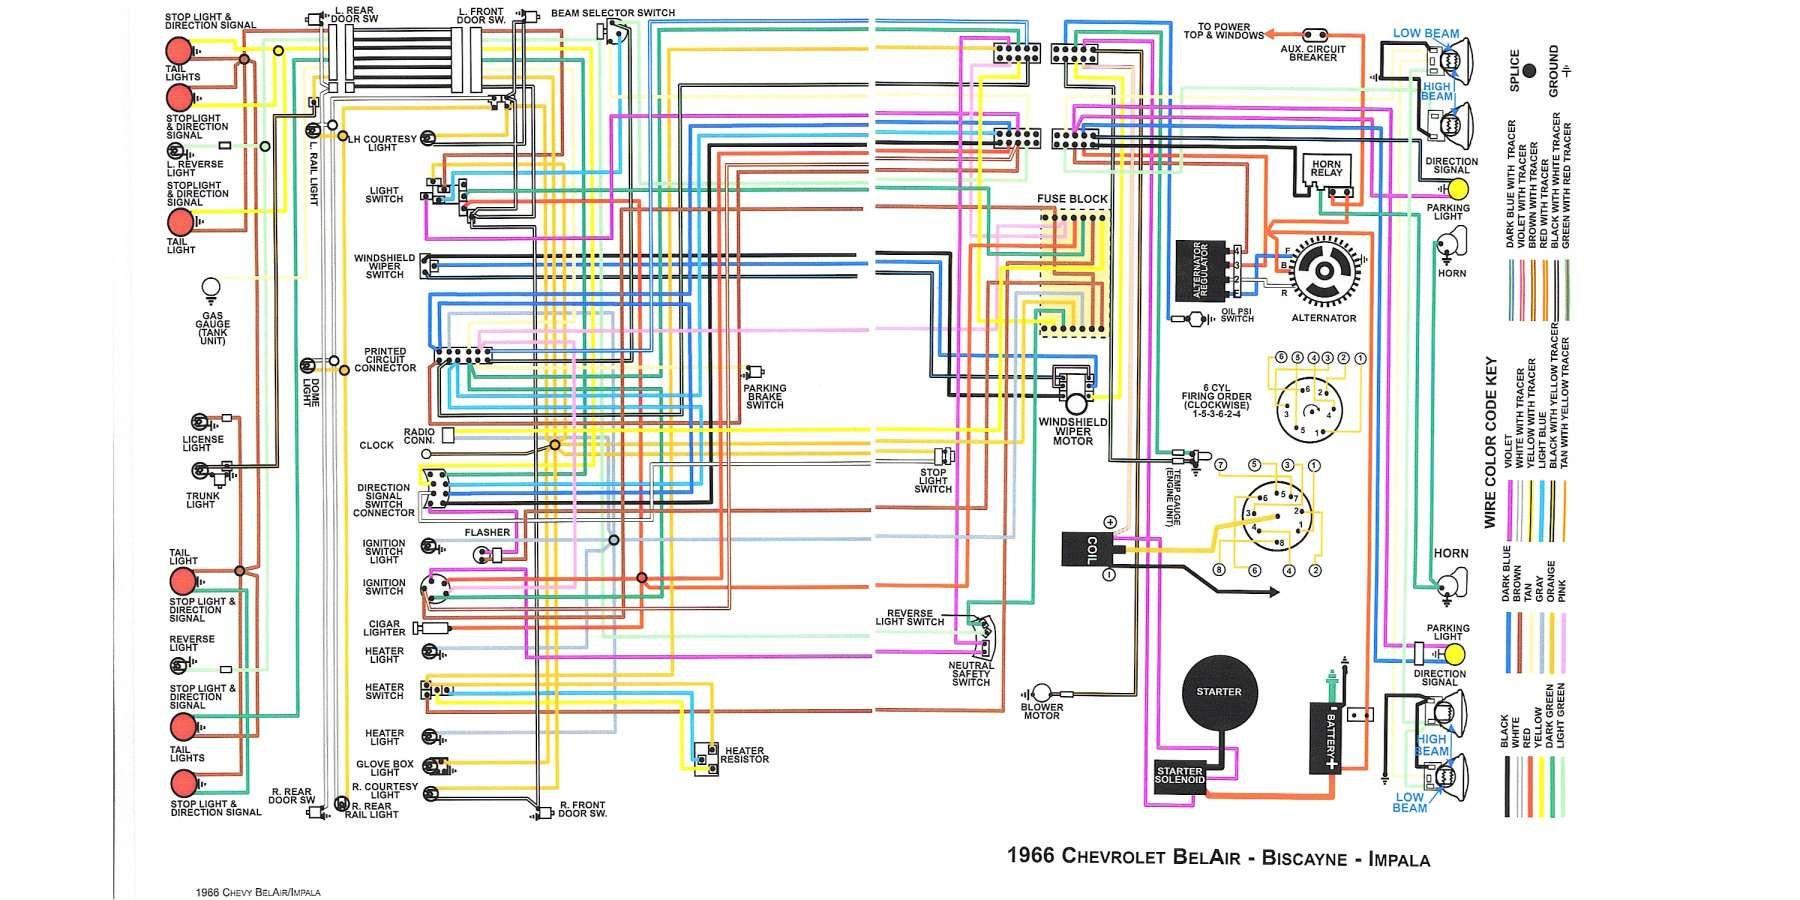 12+ 68 Camaro Engine Wiring Diagram - Engine Diagram in 2020 | Automotive  electrical, Trailer wiring diagram, Electrical wiring diagramPinterest